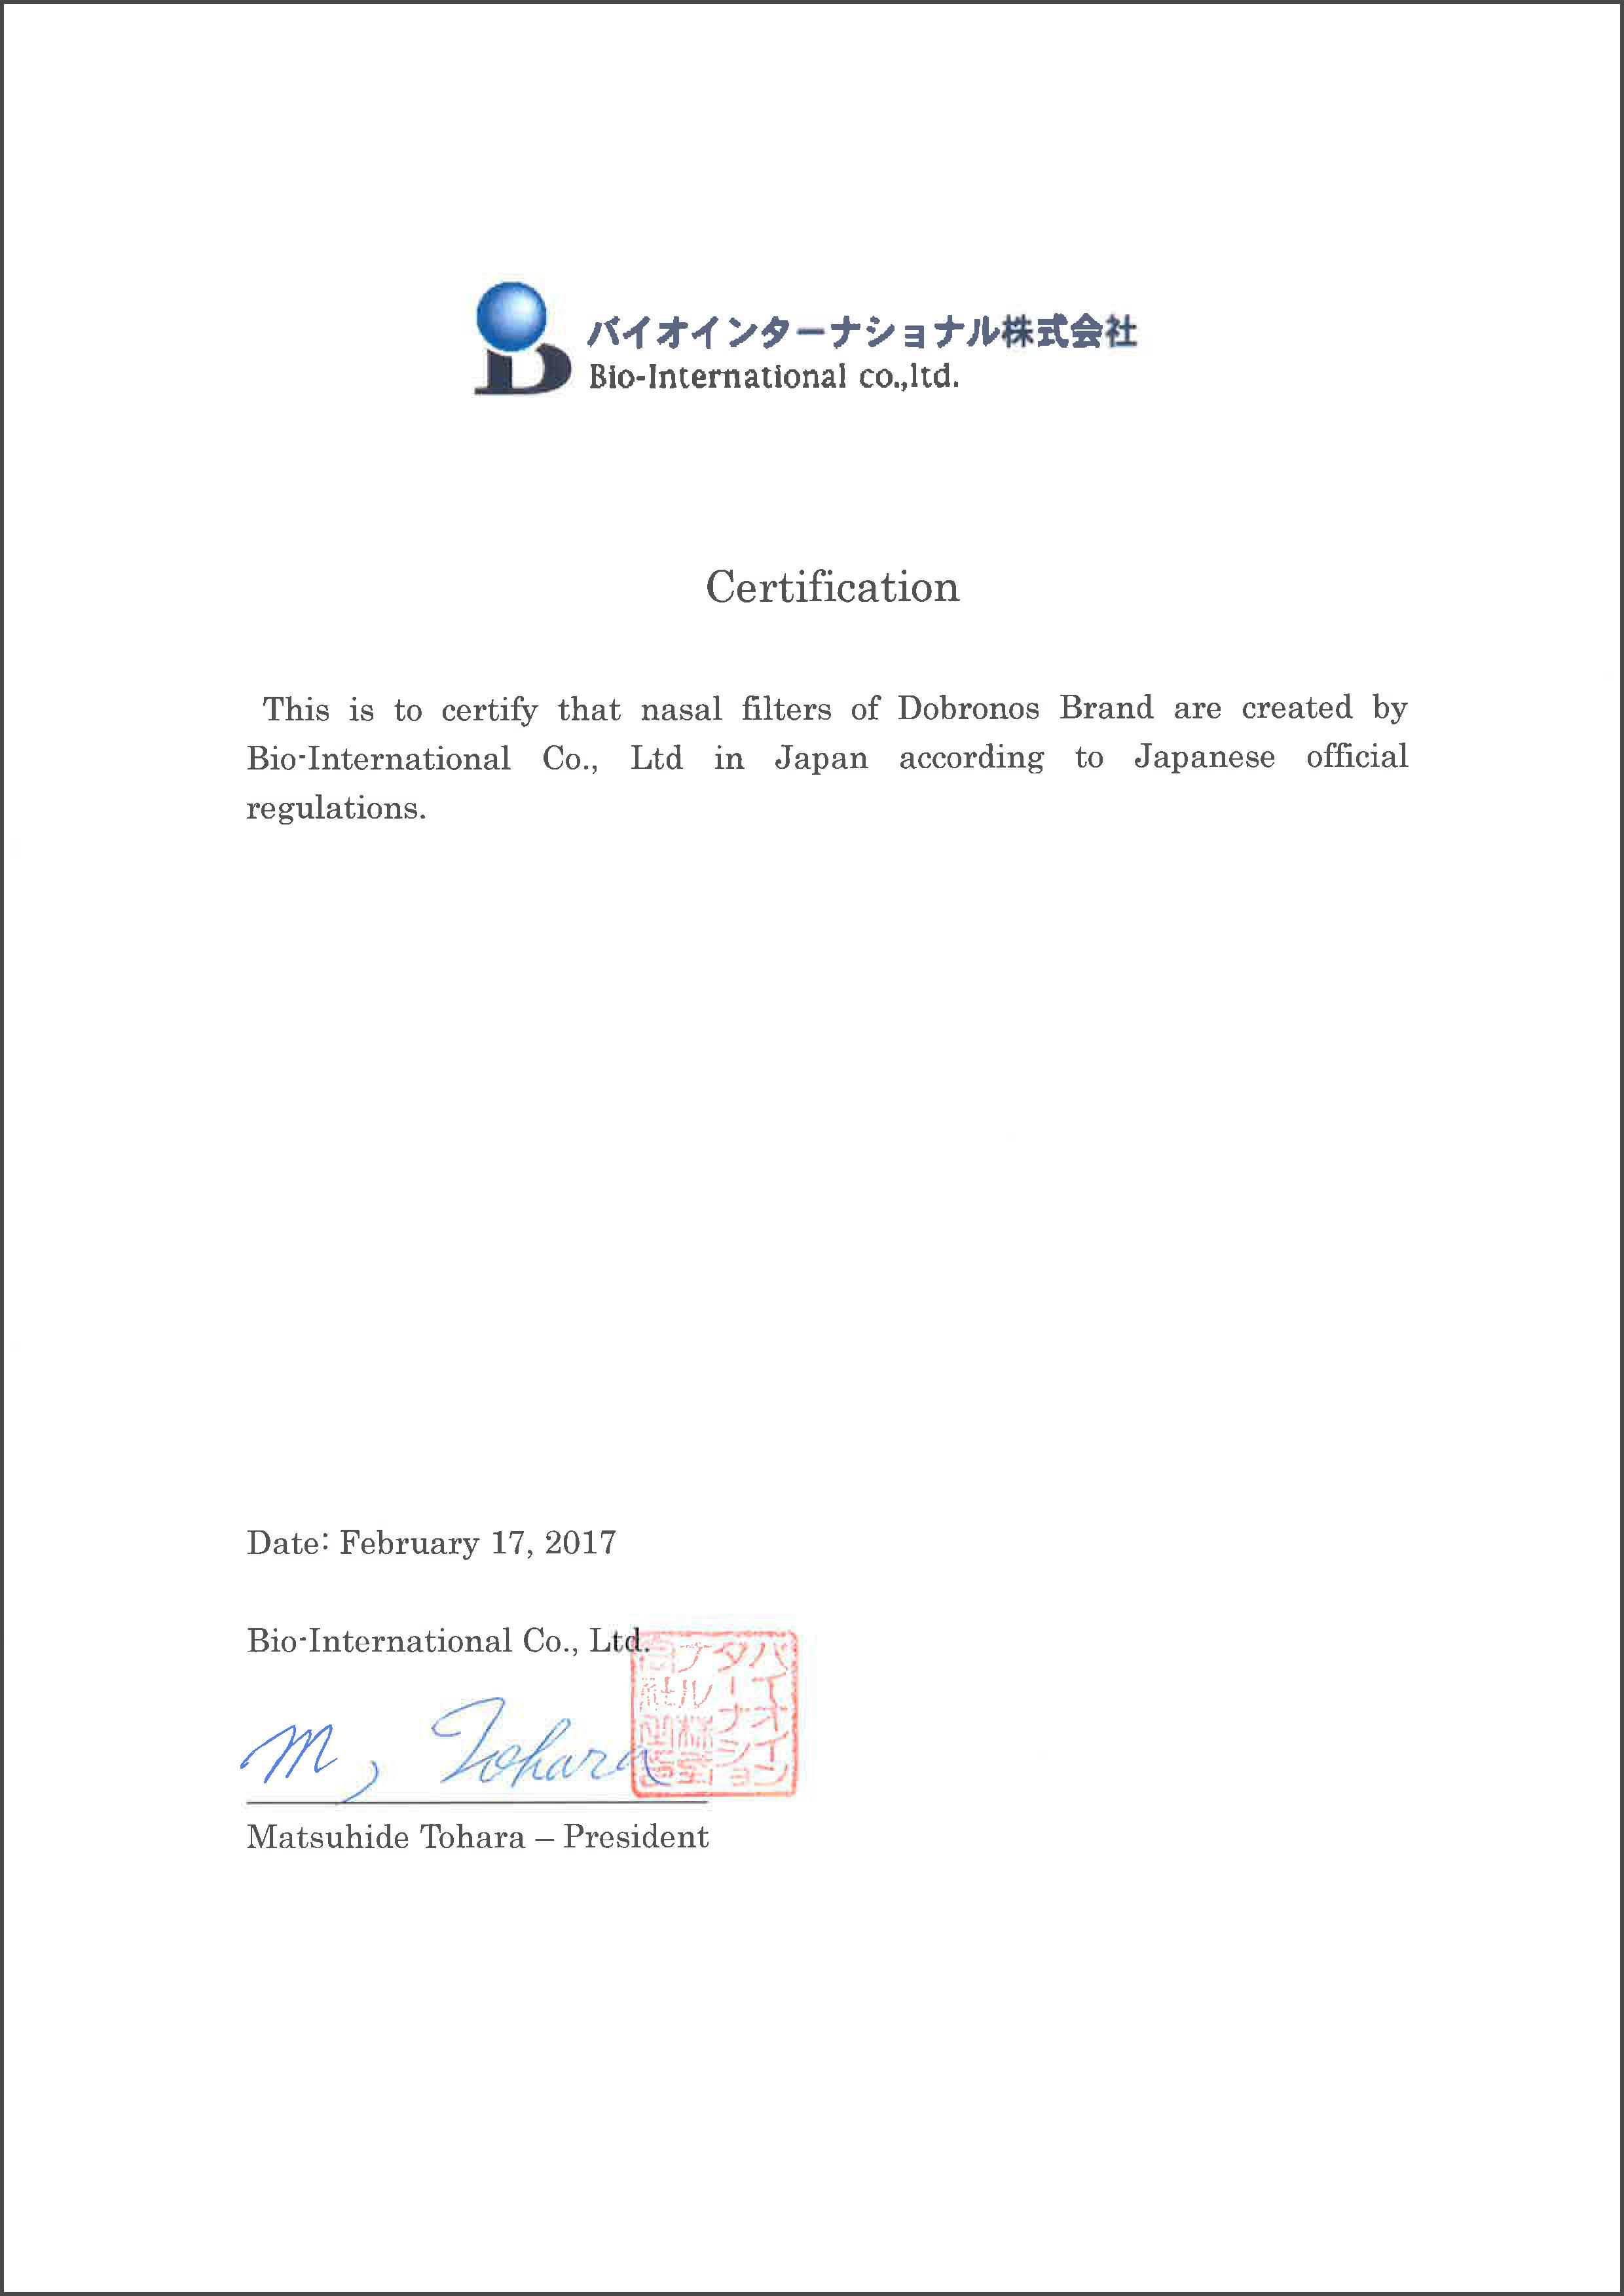 20170217_Dobronos_Certification